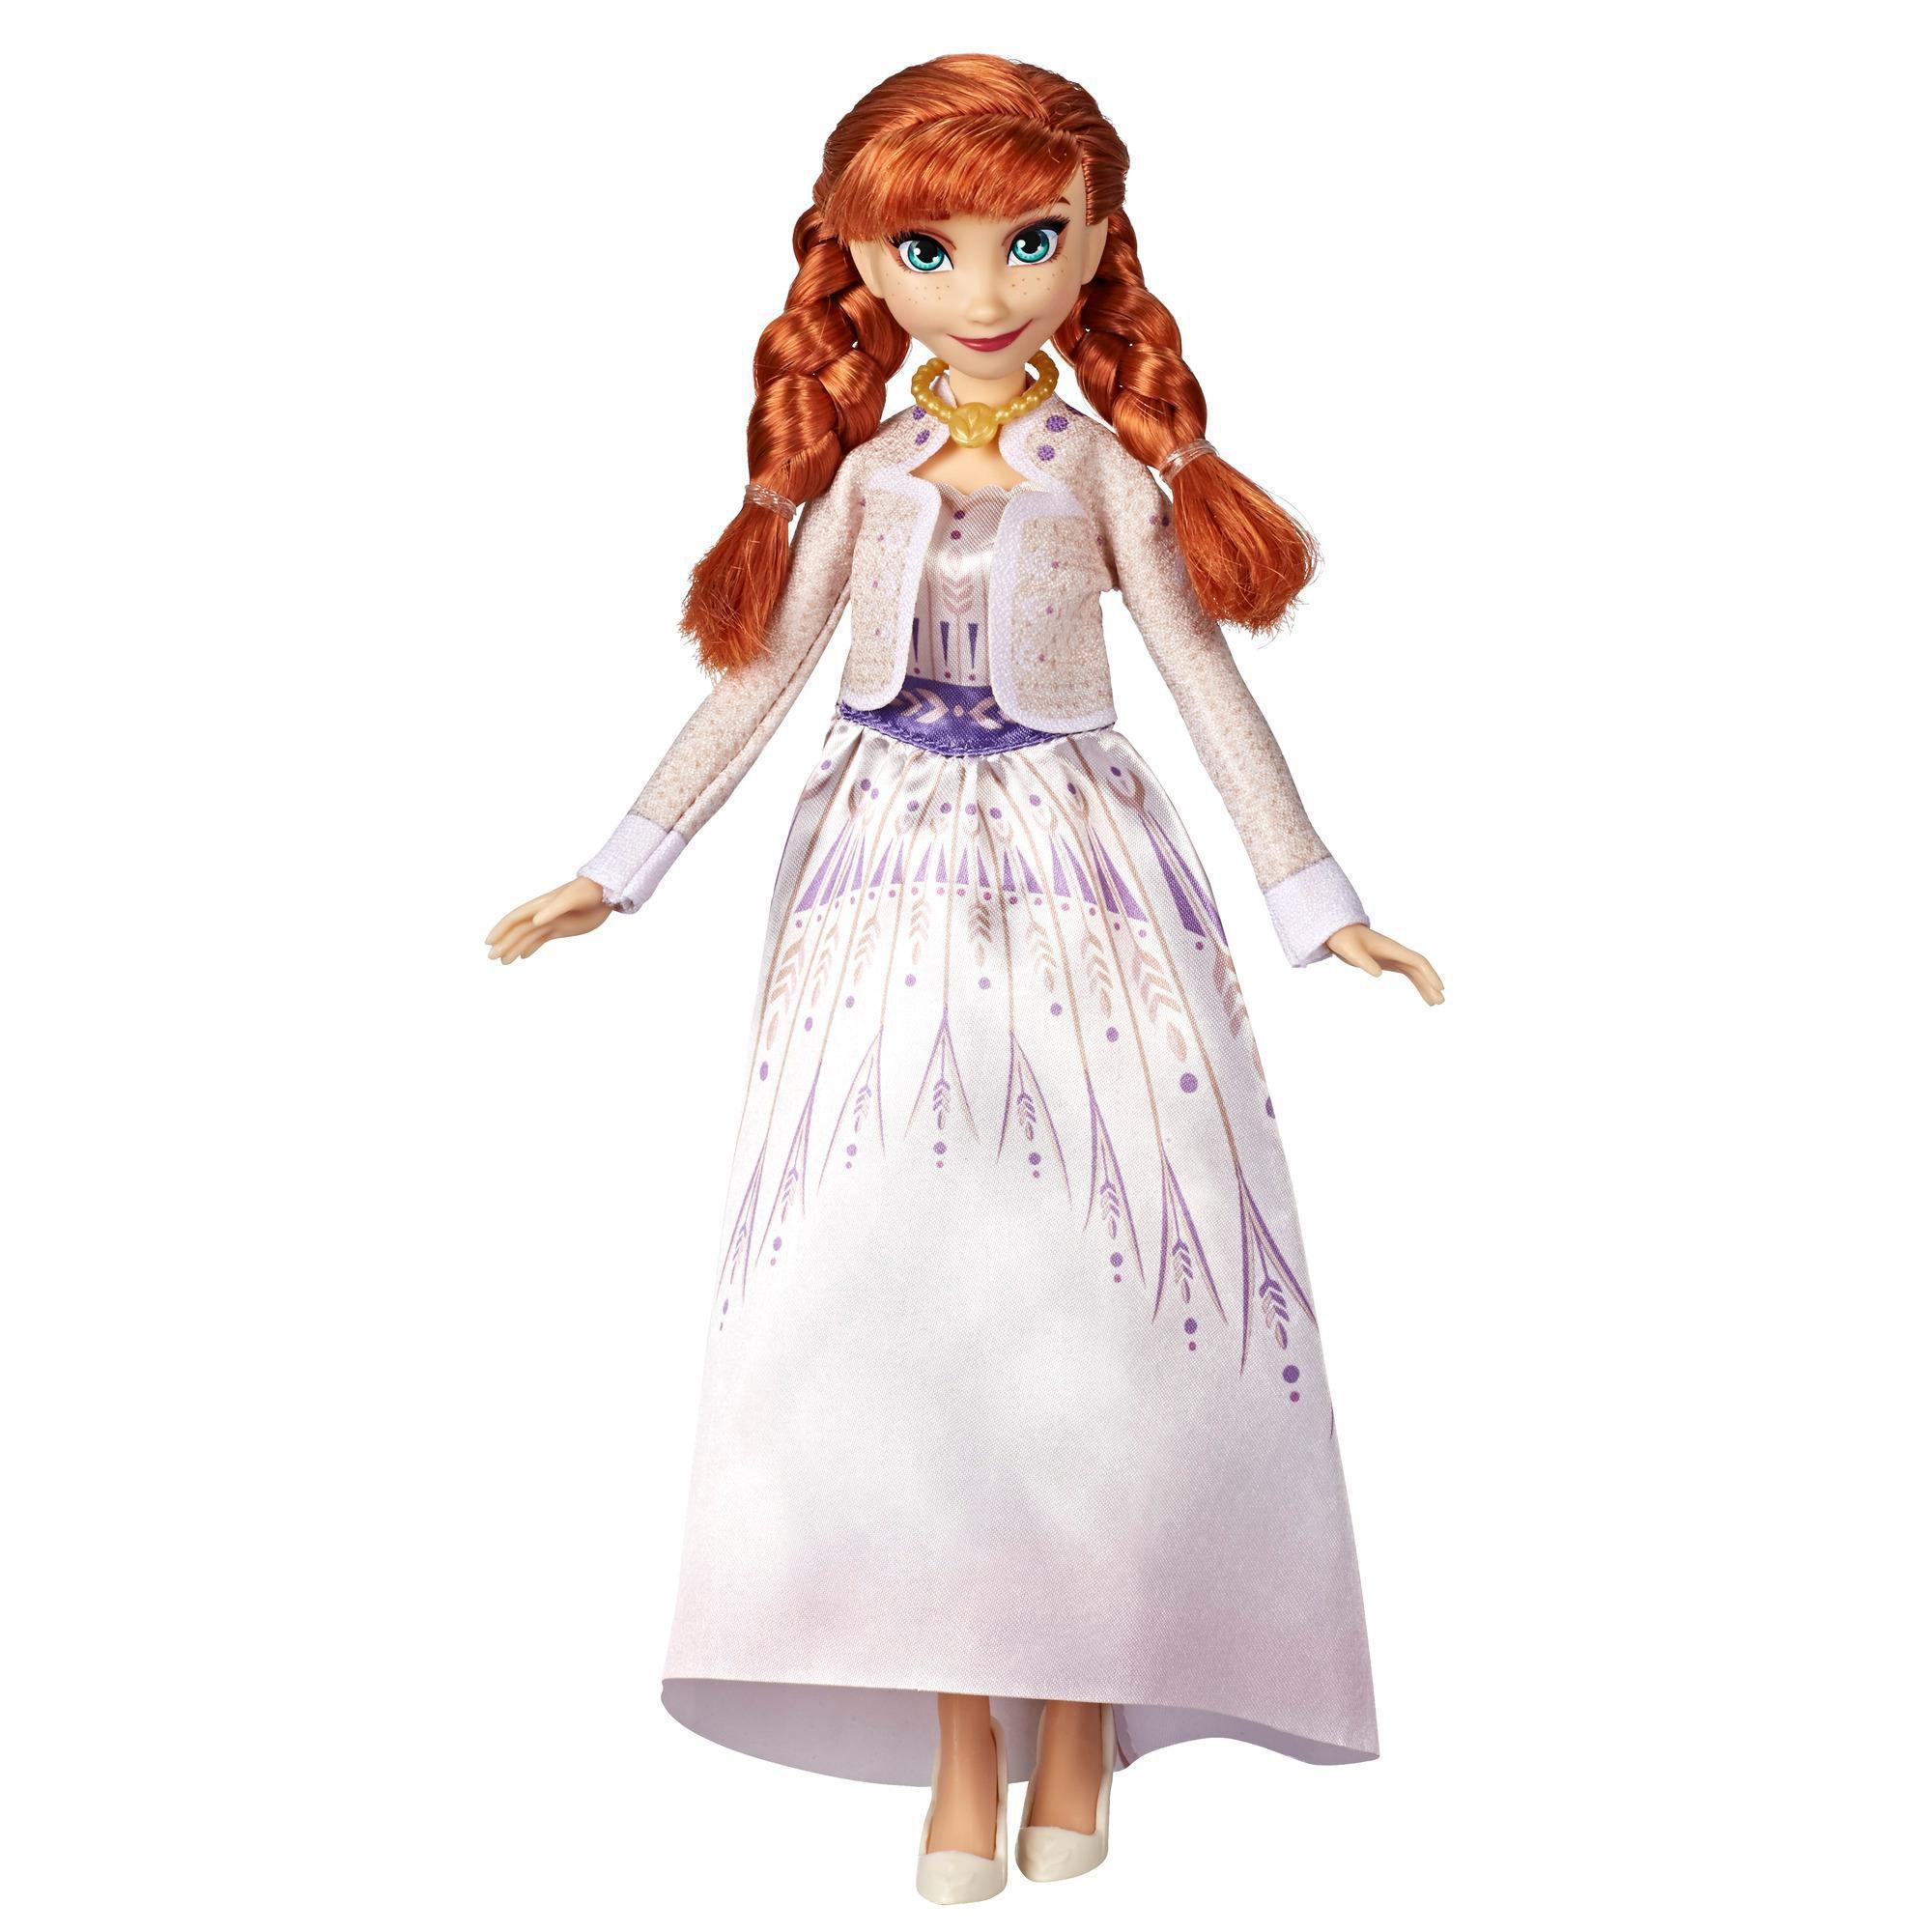 Frozen 2 - Boneca Anna Trajes de Arendelle E6908 - Hasbro E5500